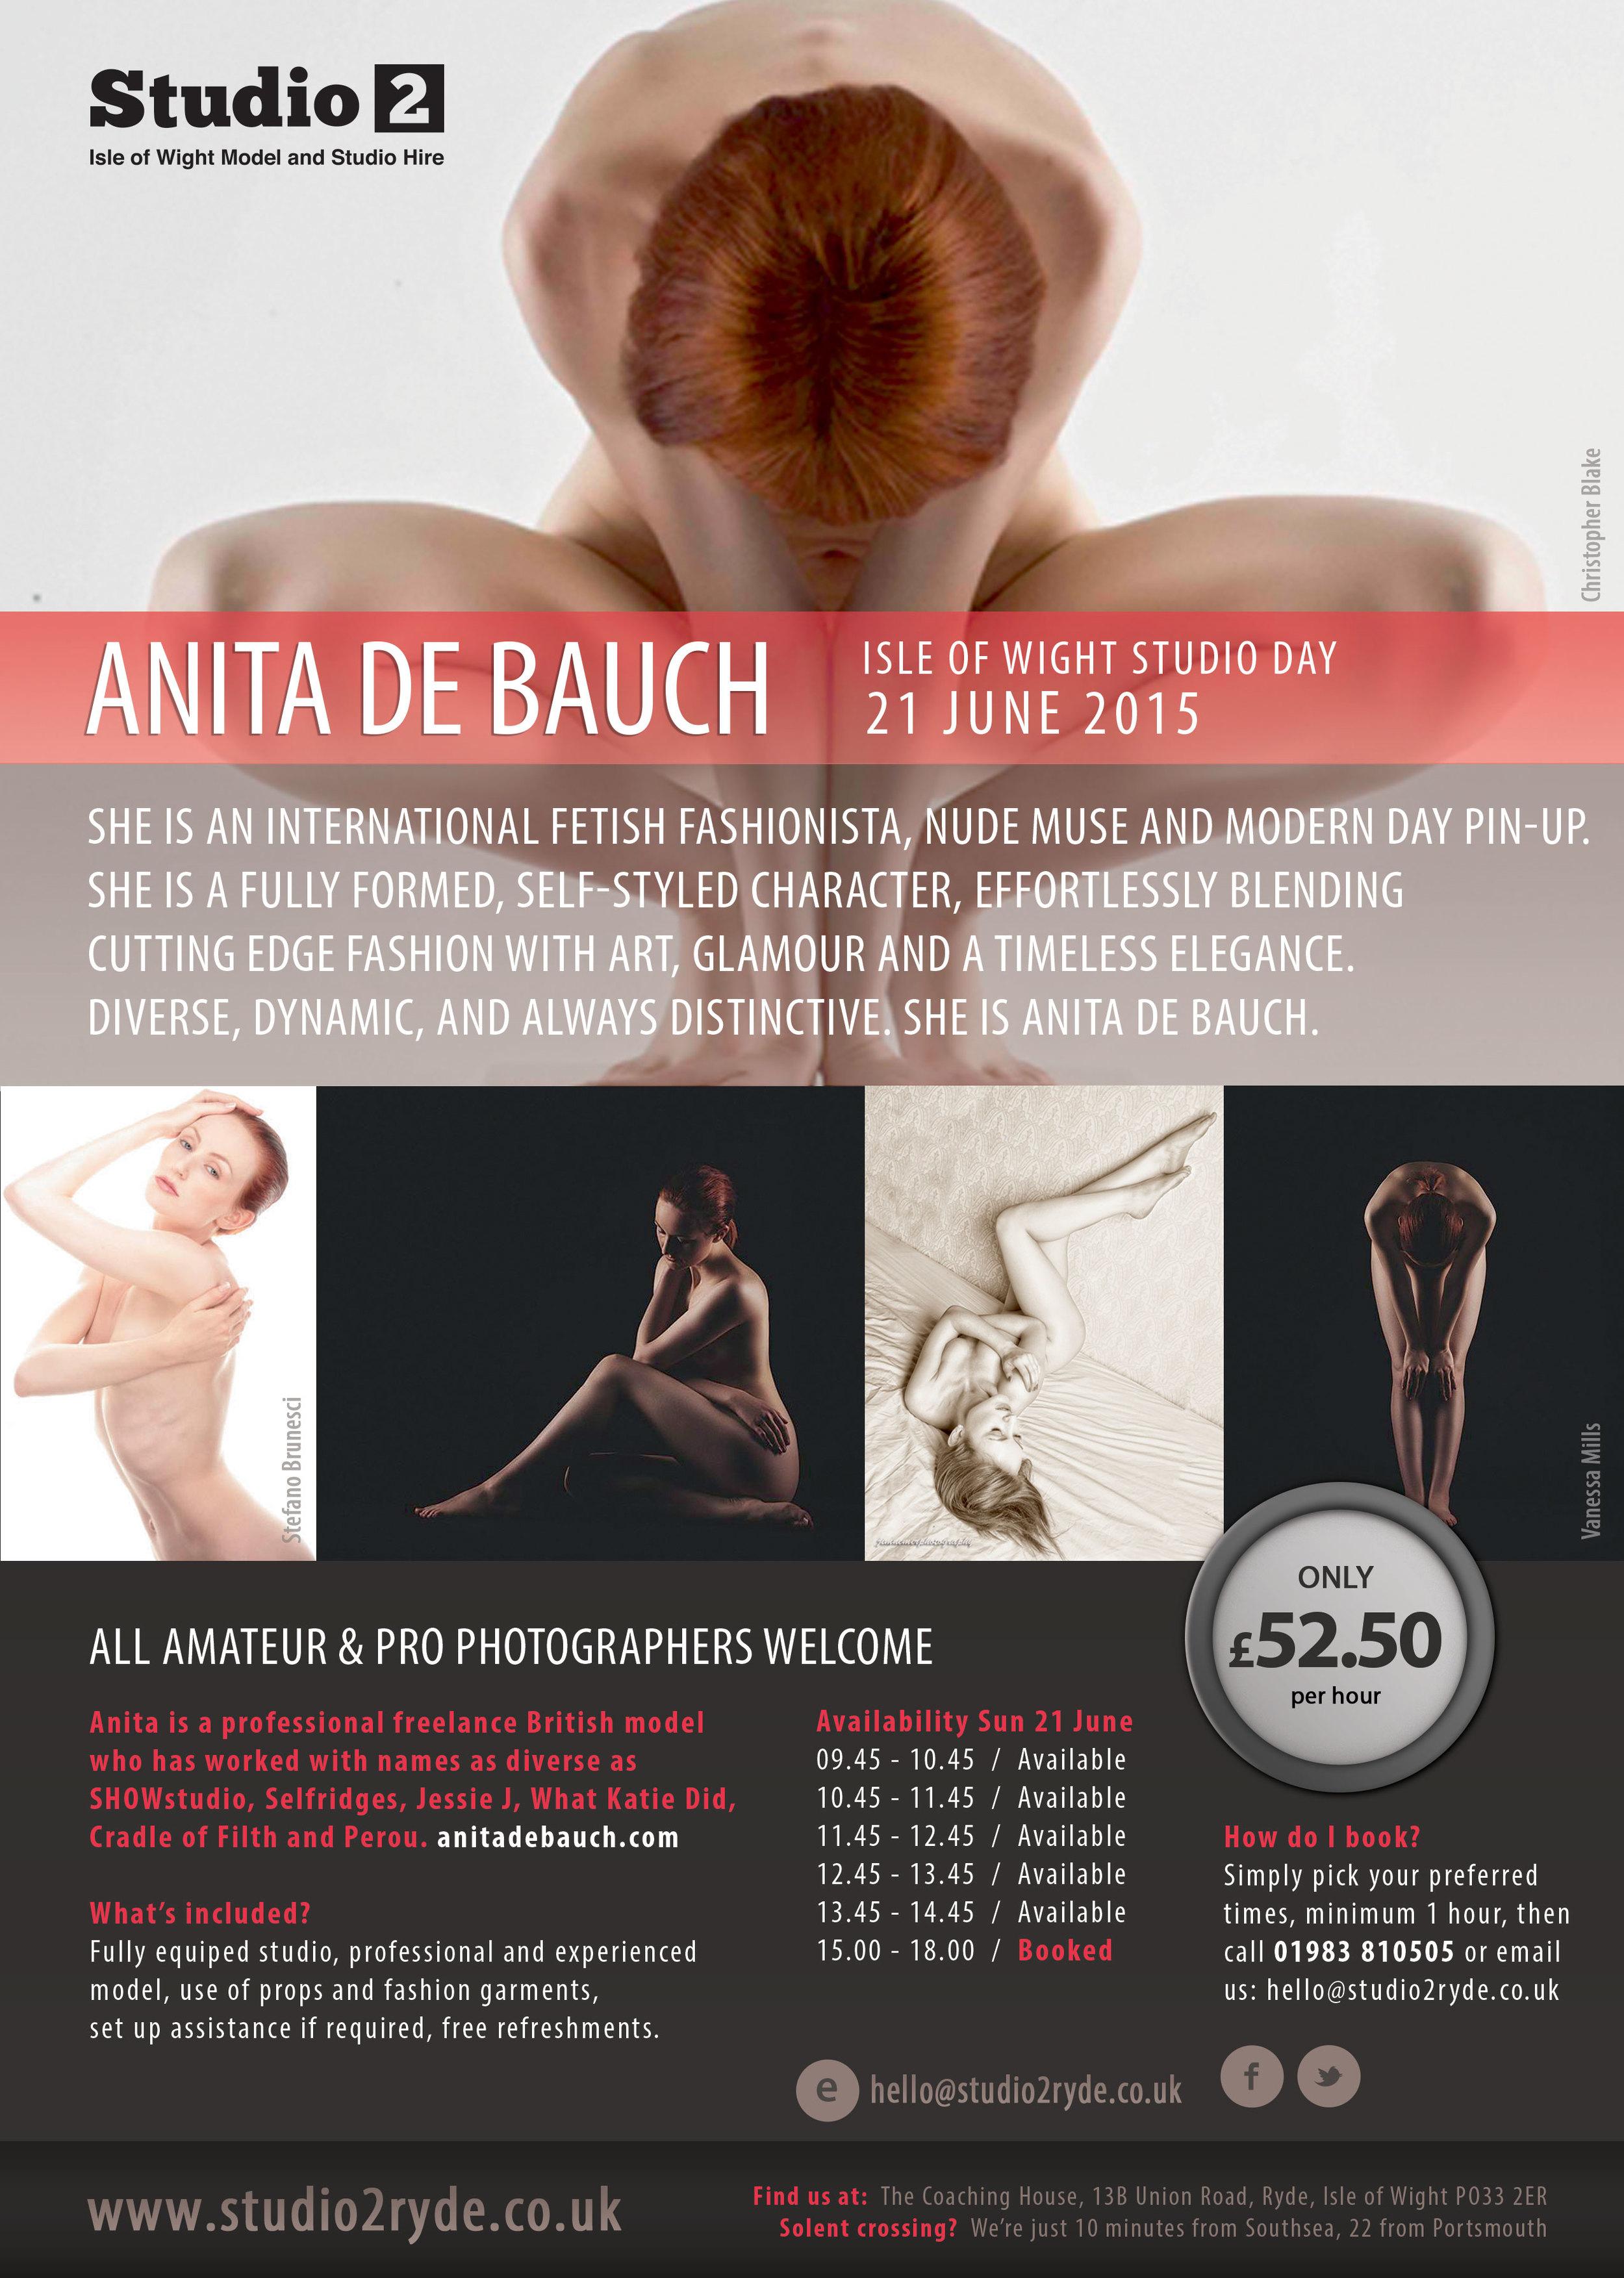 Studio-Day-Flyer-Anita-De-Bauch.jpg